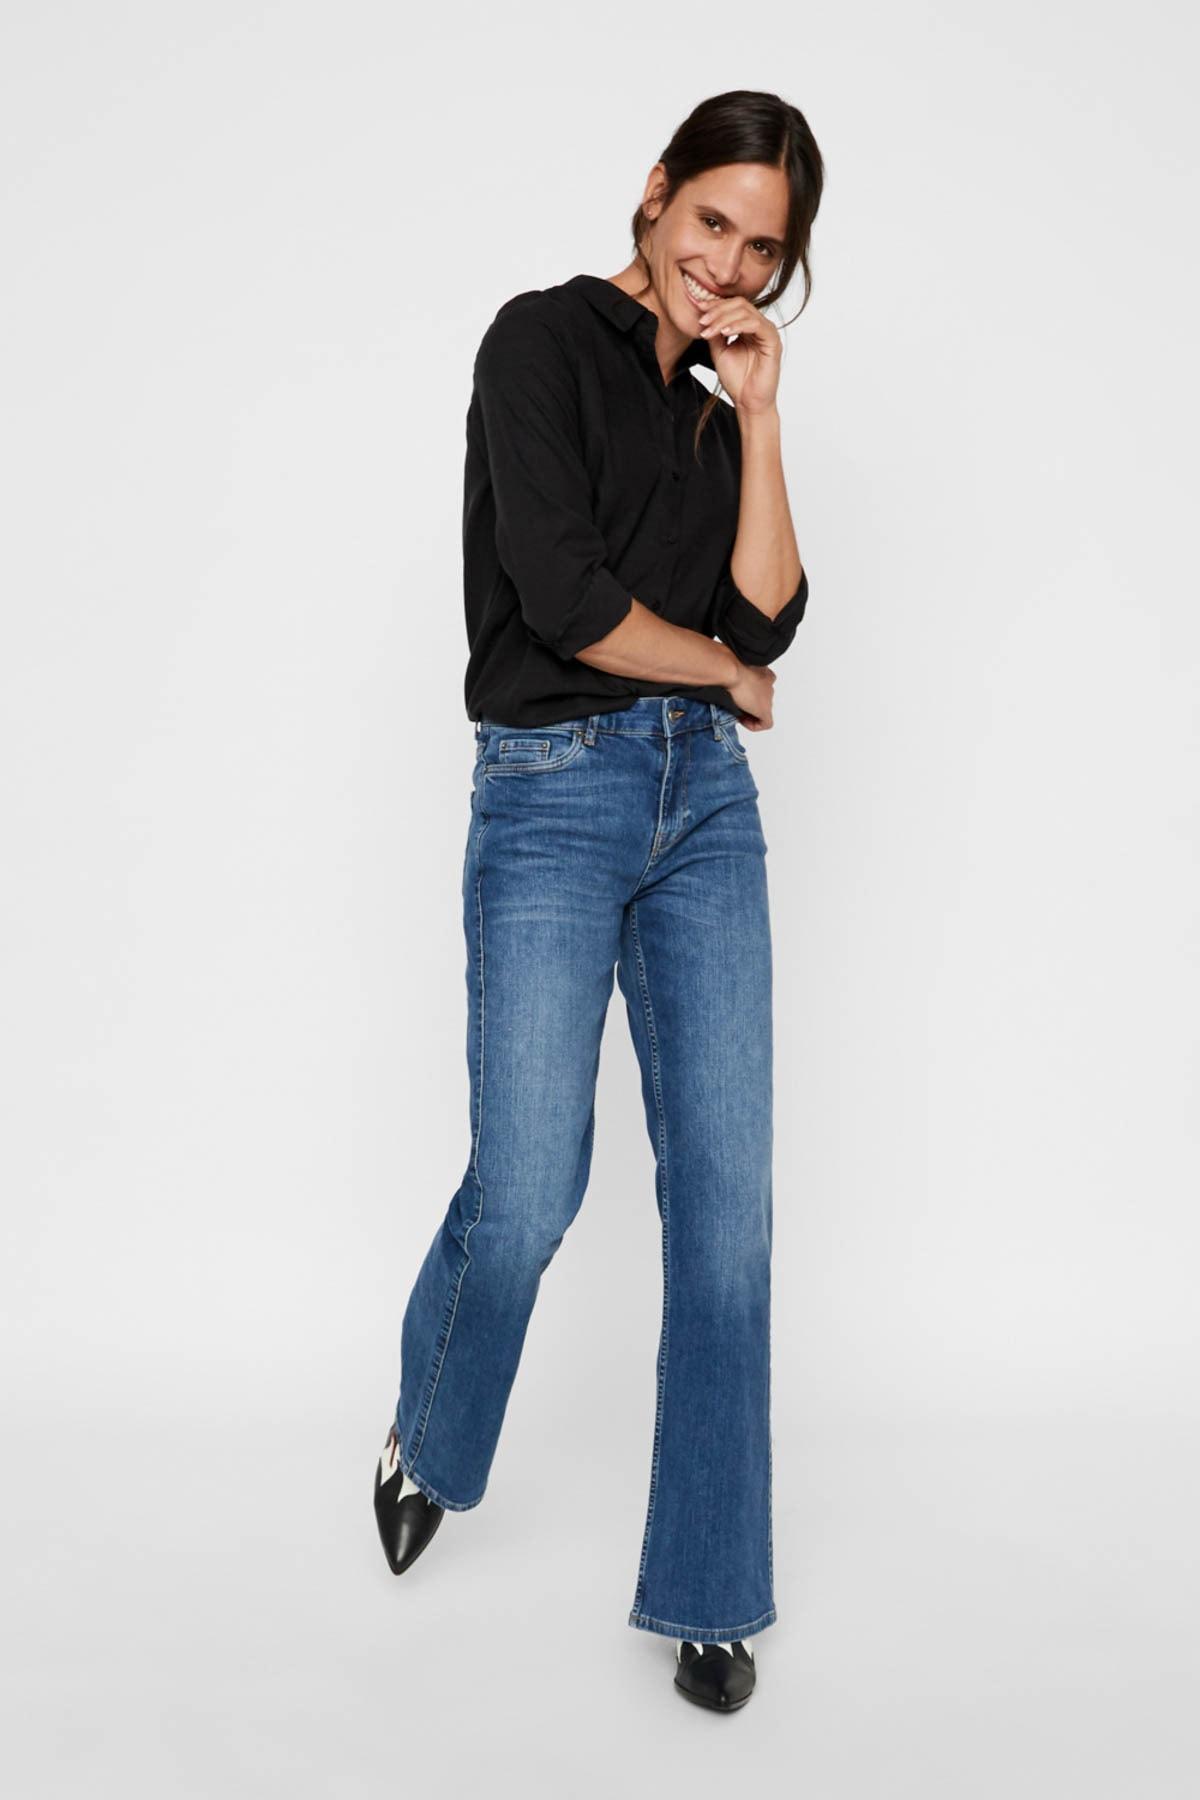 Vero Moda Kadın Siyah Siyah Uzun Kollu Lyocell Gömlek 10218724 VMTANYA 2